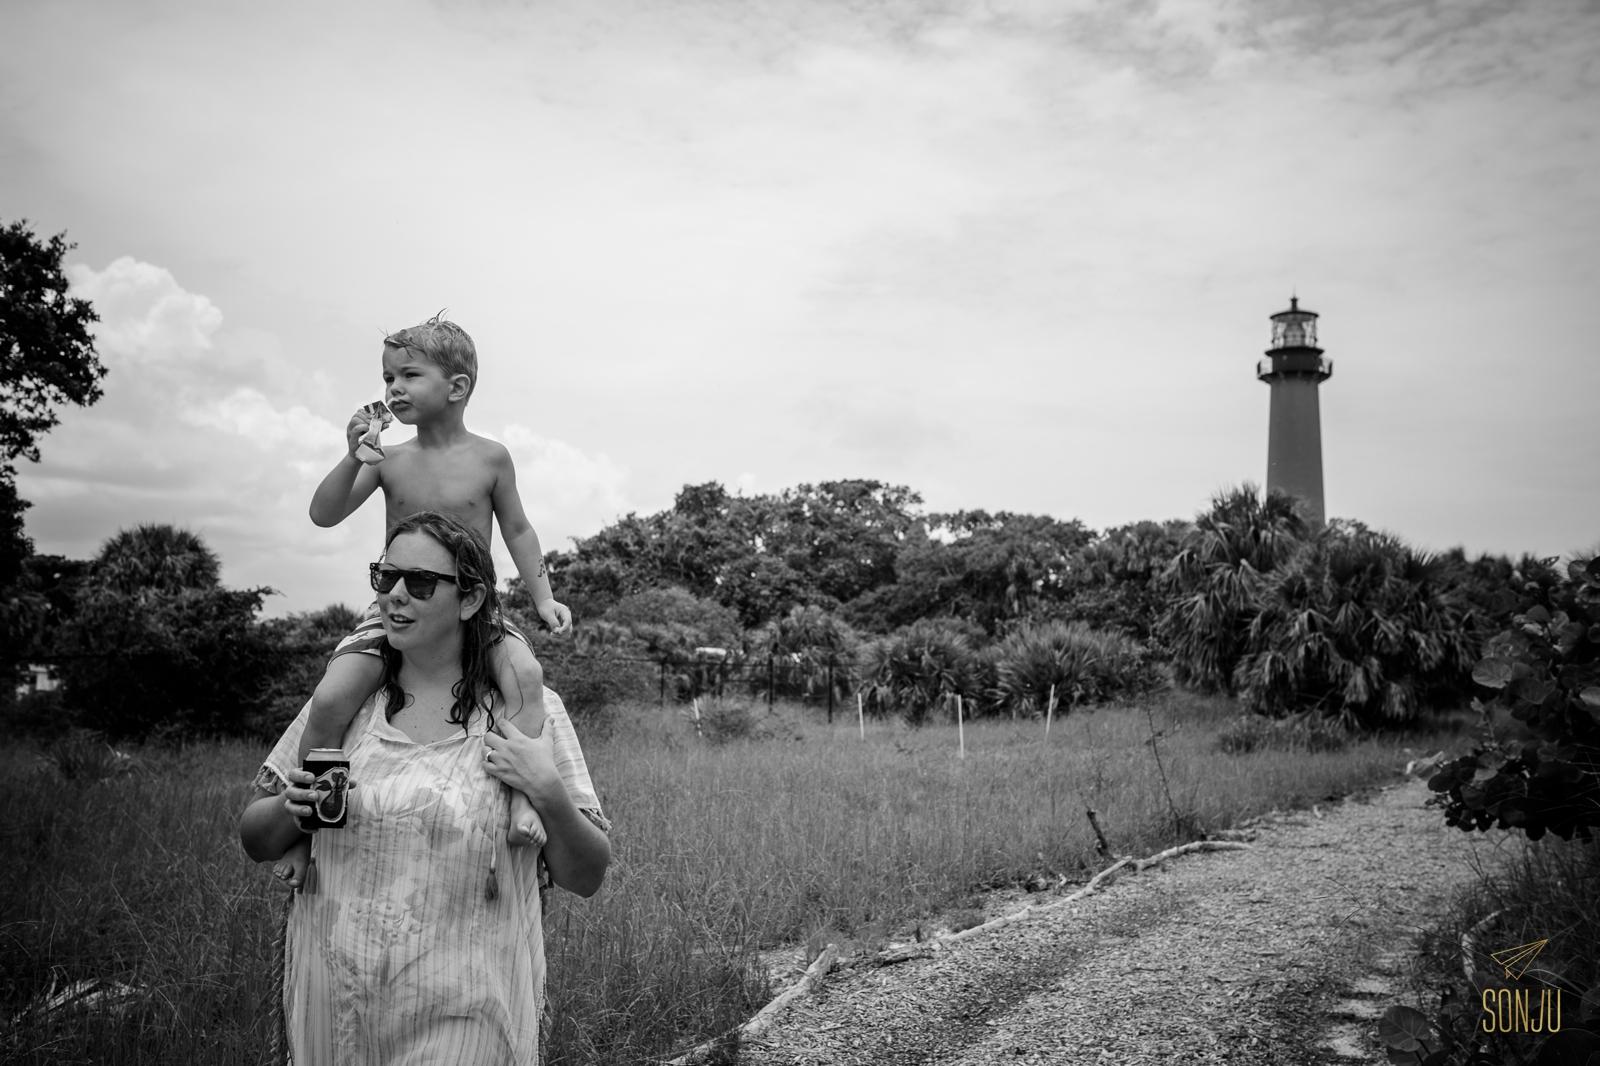 Florida-family-photography-documentary-DITL-Jupiter-Sonju00023.jpg